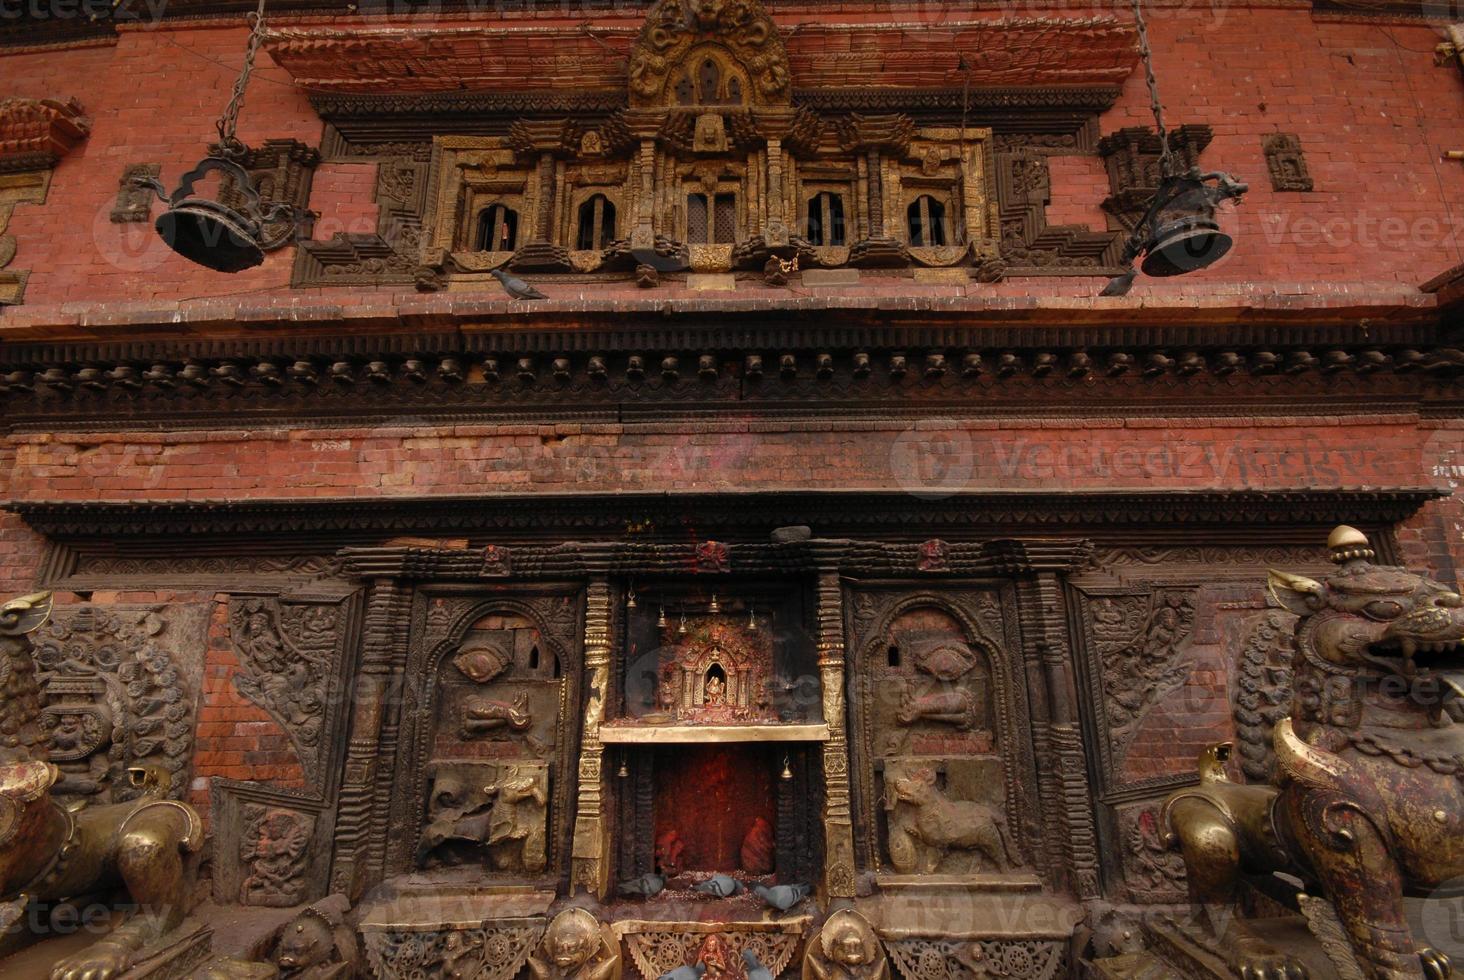 Bronzegöttin an der Wand im Hindu-Tempel. foto